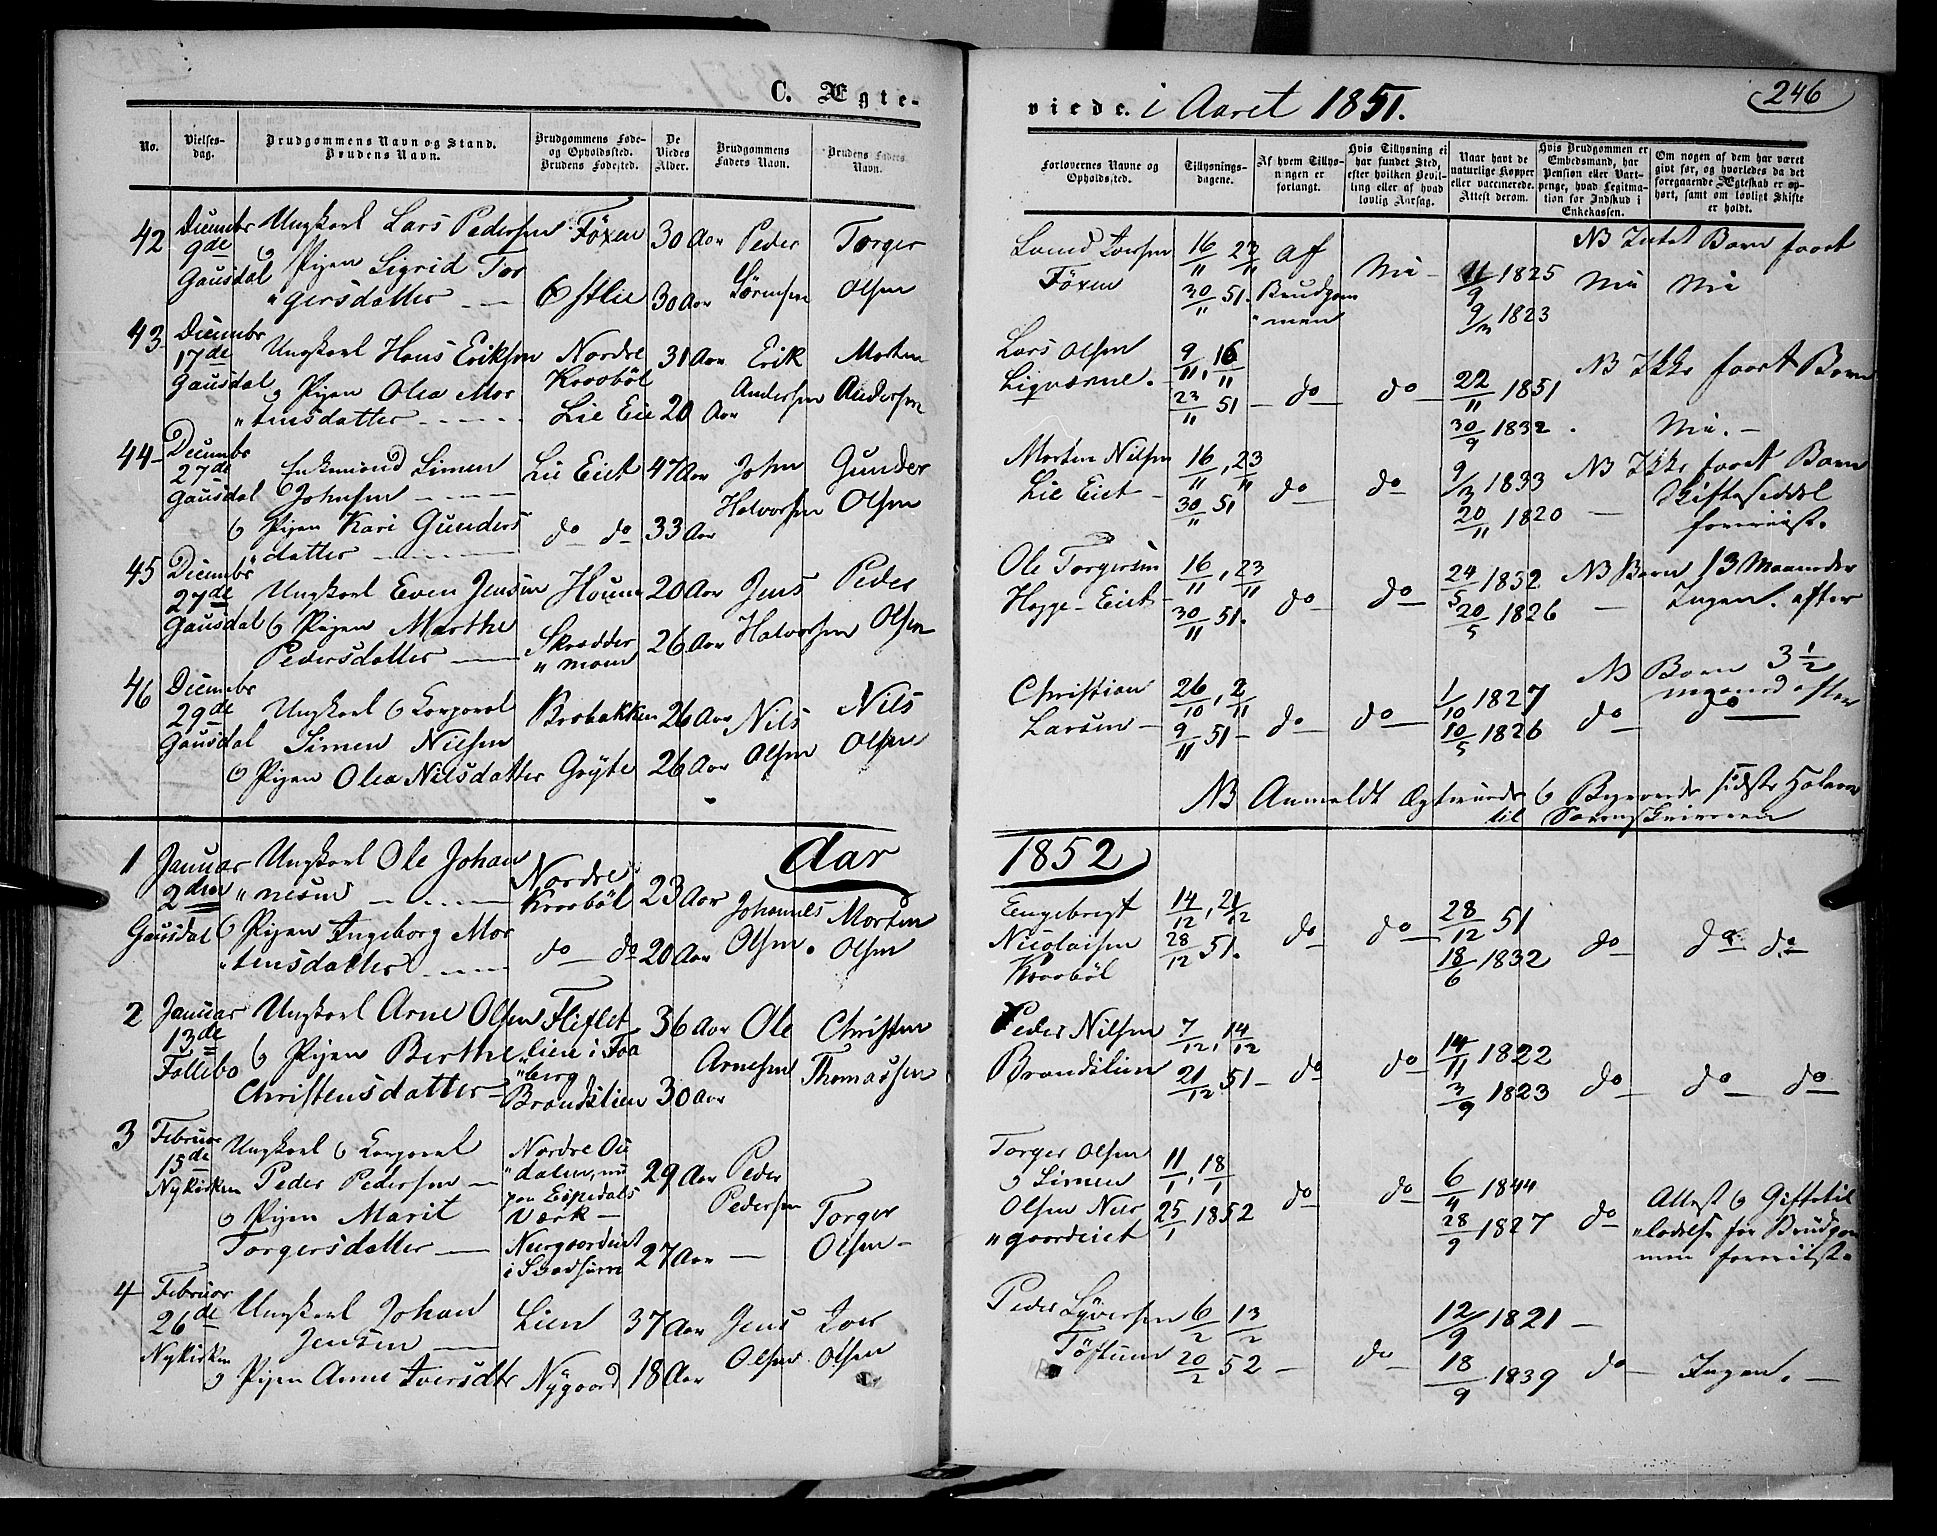 SAH, Gausdal prestekontor, Ministerialbok nr. 8, 1850-1861, s. 246